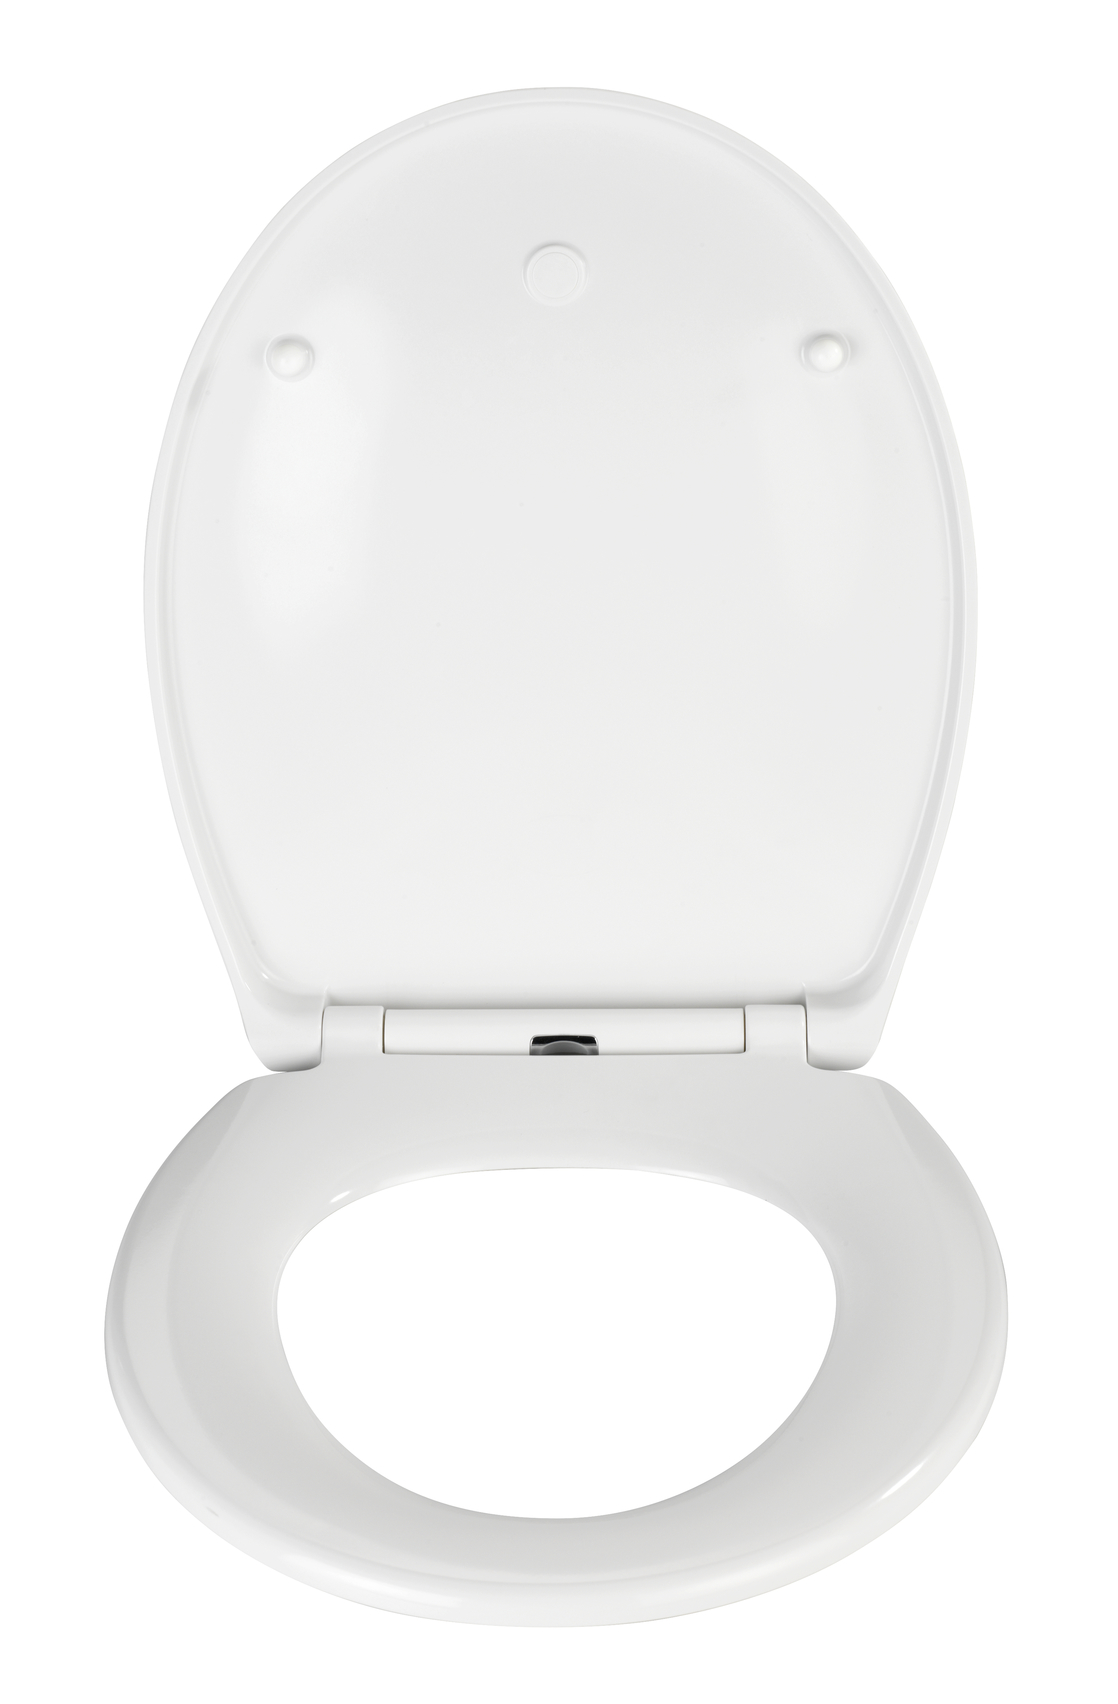 wc sitz kinder toilettensitz kindersitz absenkautomatik. Black Bedroom Furniture Sets. Home Design Ideas